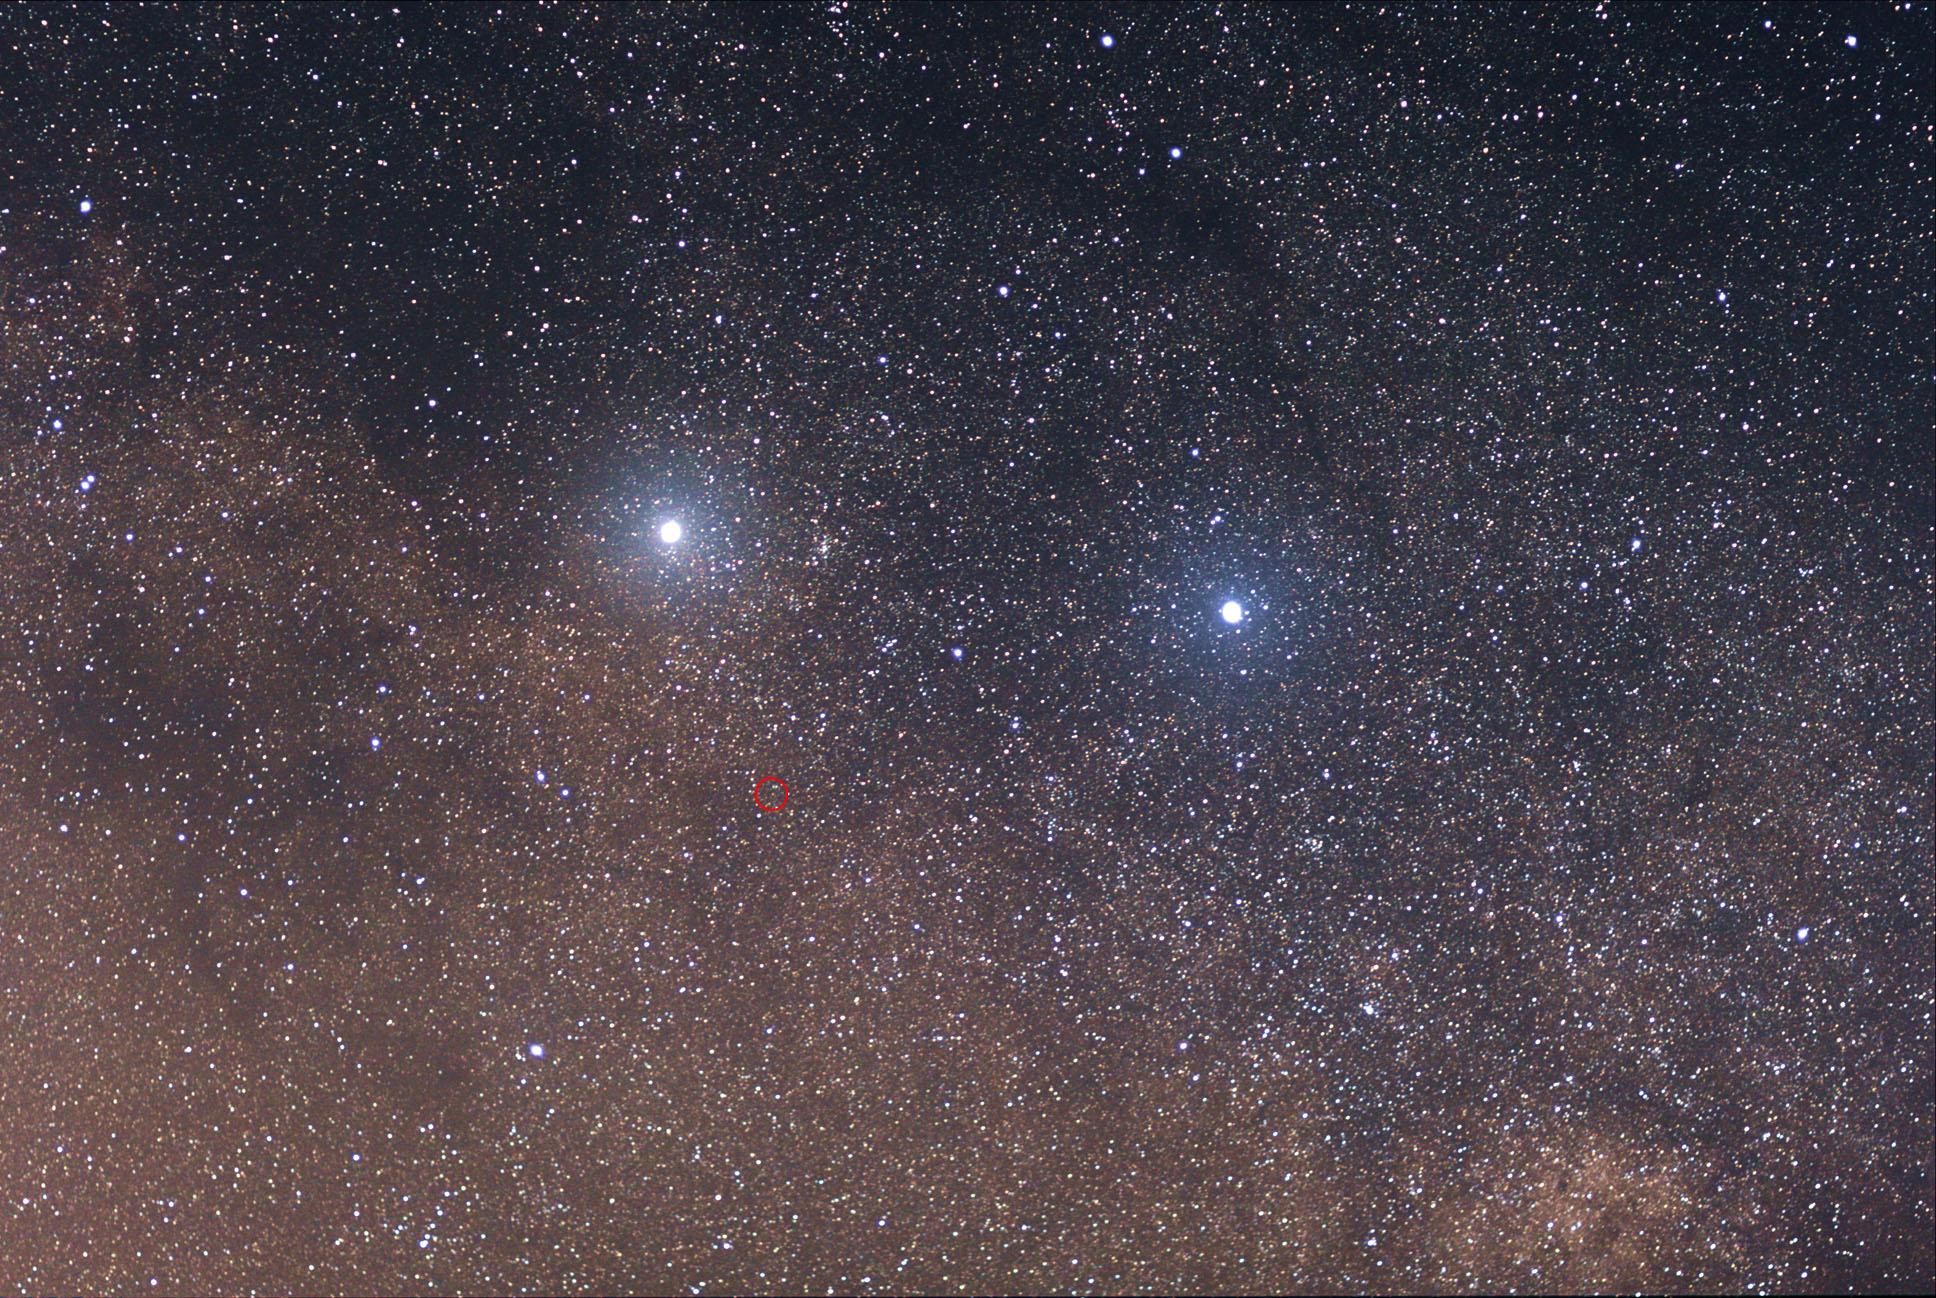 The two bright stars are (left) Alpha Centauri and (right) Beta Centauri. The faint red star in the... [+] center of the red circle is Proxima Centauri. Image credit: Wikimedia user Skatebiker, CC A-SA 3.0